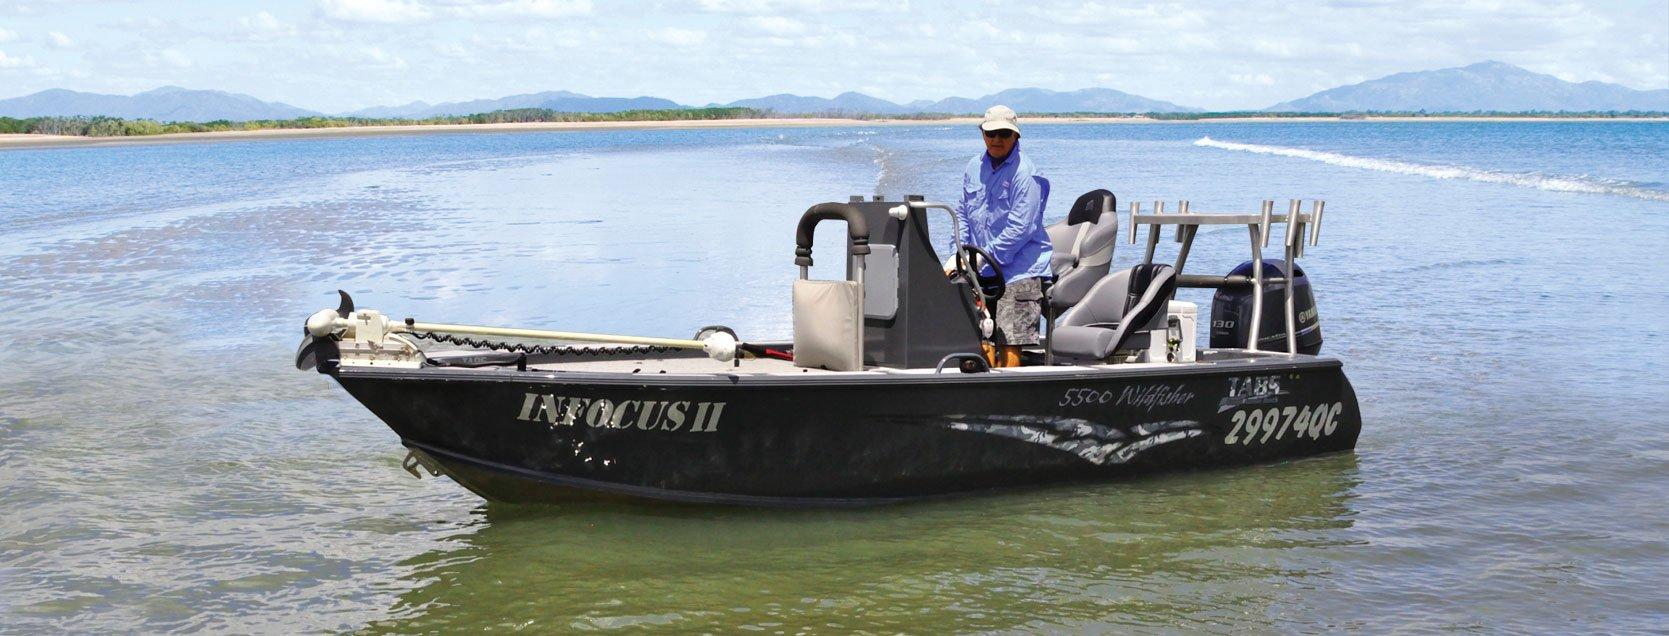 Chartered Fishing Boat Hervey Bay